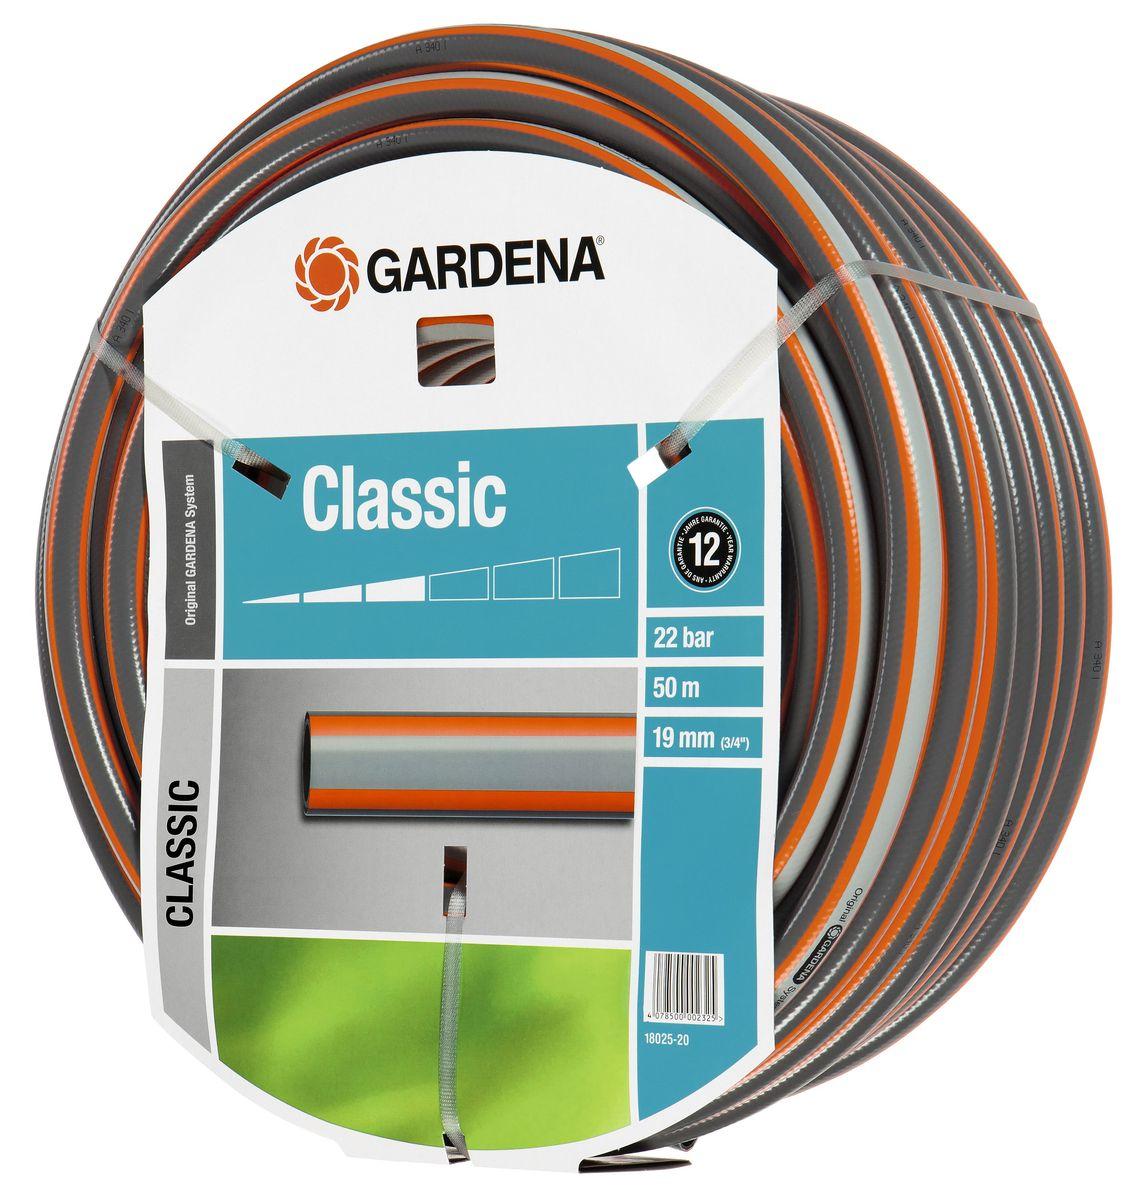 Шланг Gardena Classic, 19 мм (3/4) х 50 м шланг подающий gardena 3 16 4 6мм 50м 01348 20 000 00